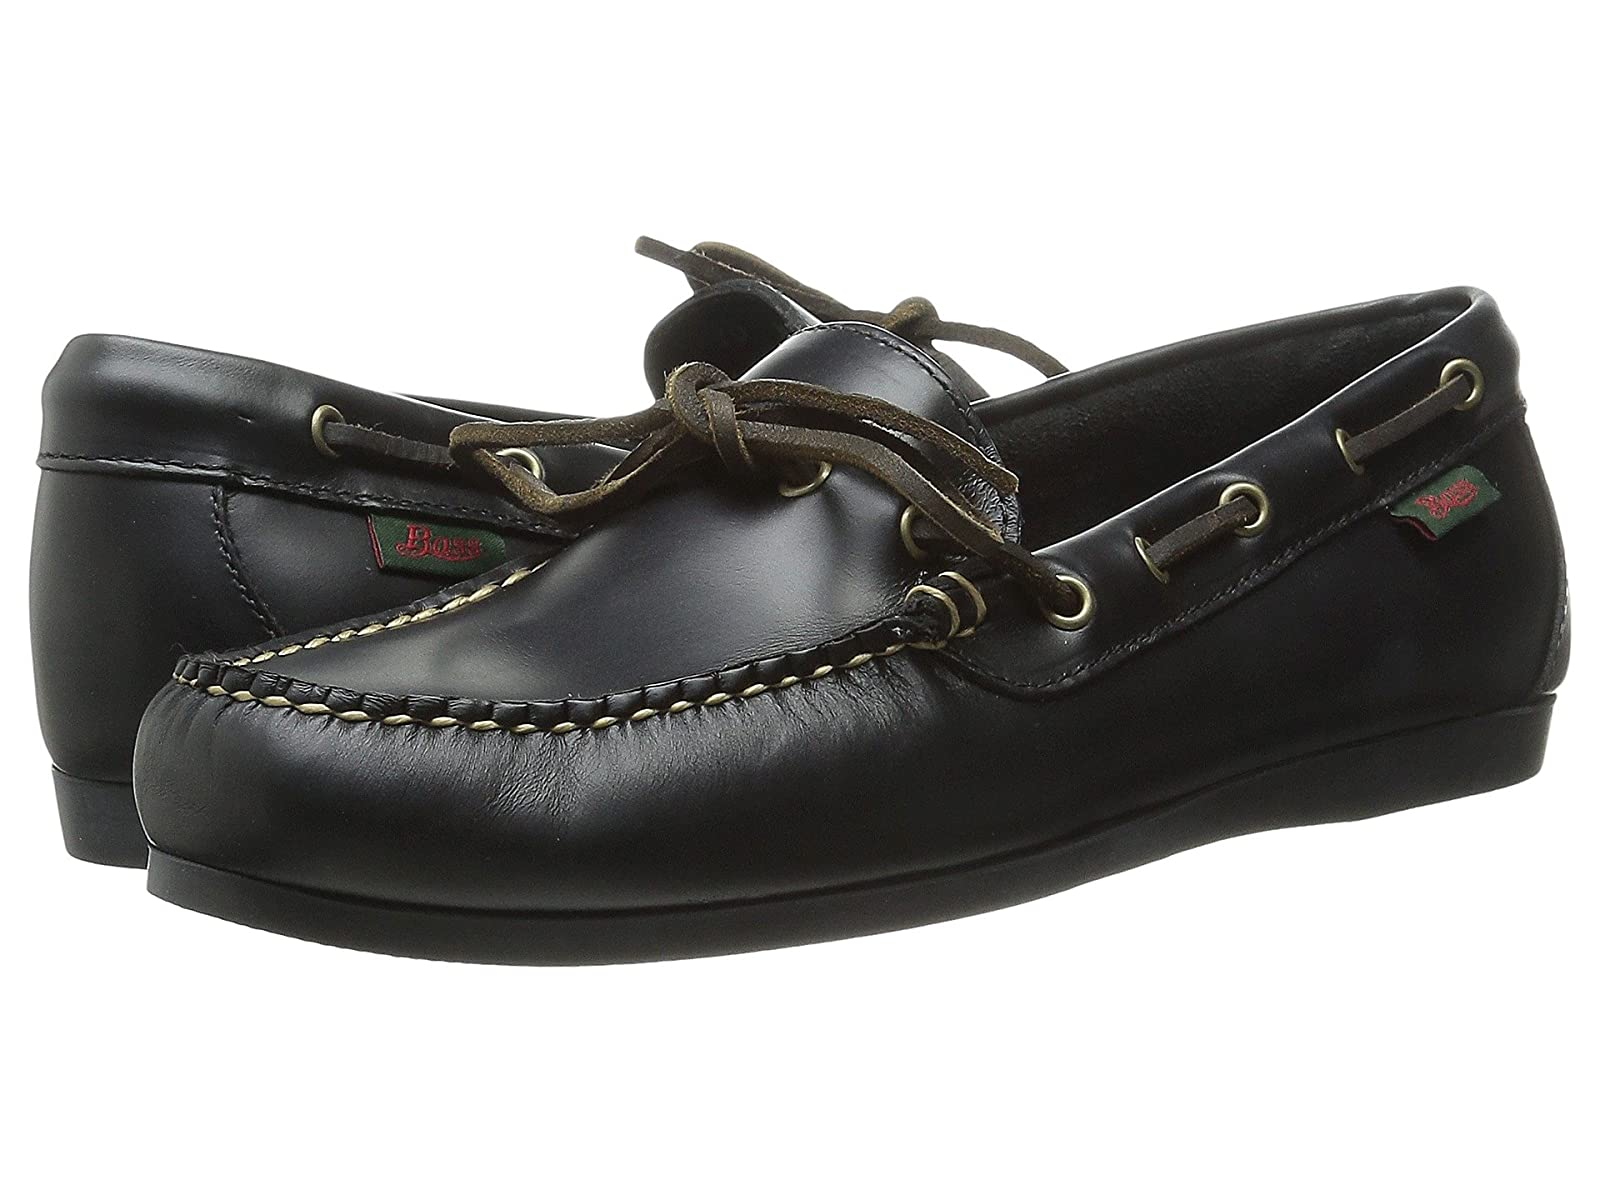 Bass SeabridgeCheap and distinctive eye-catching shoes